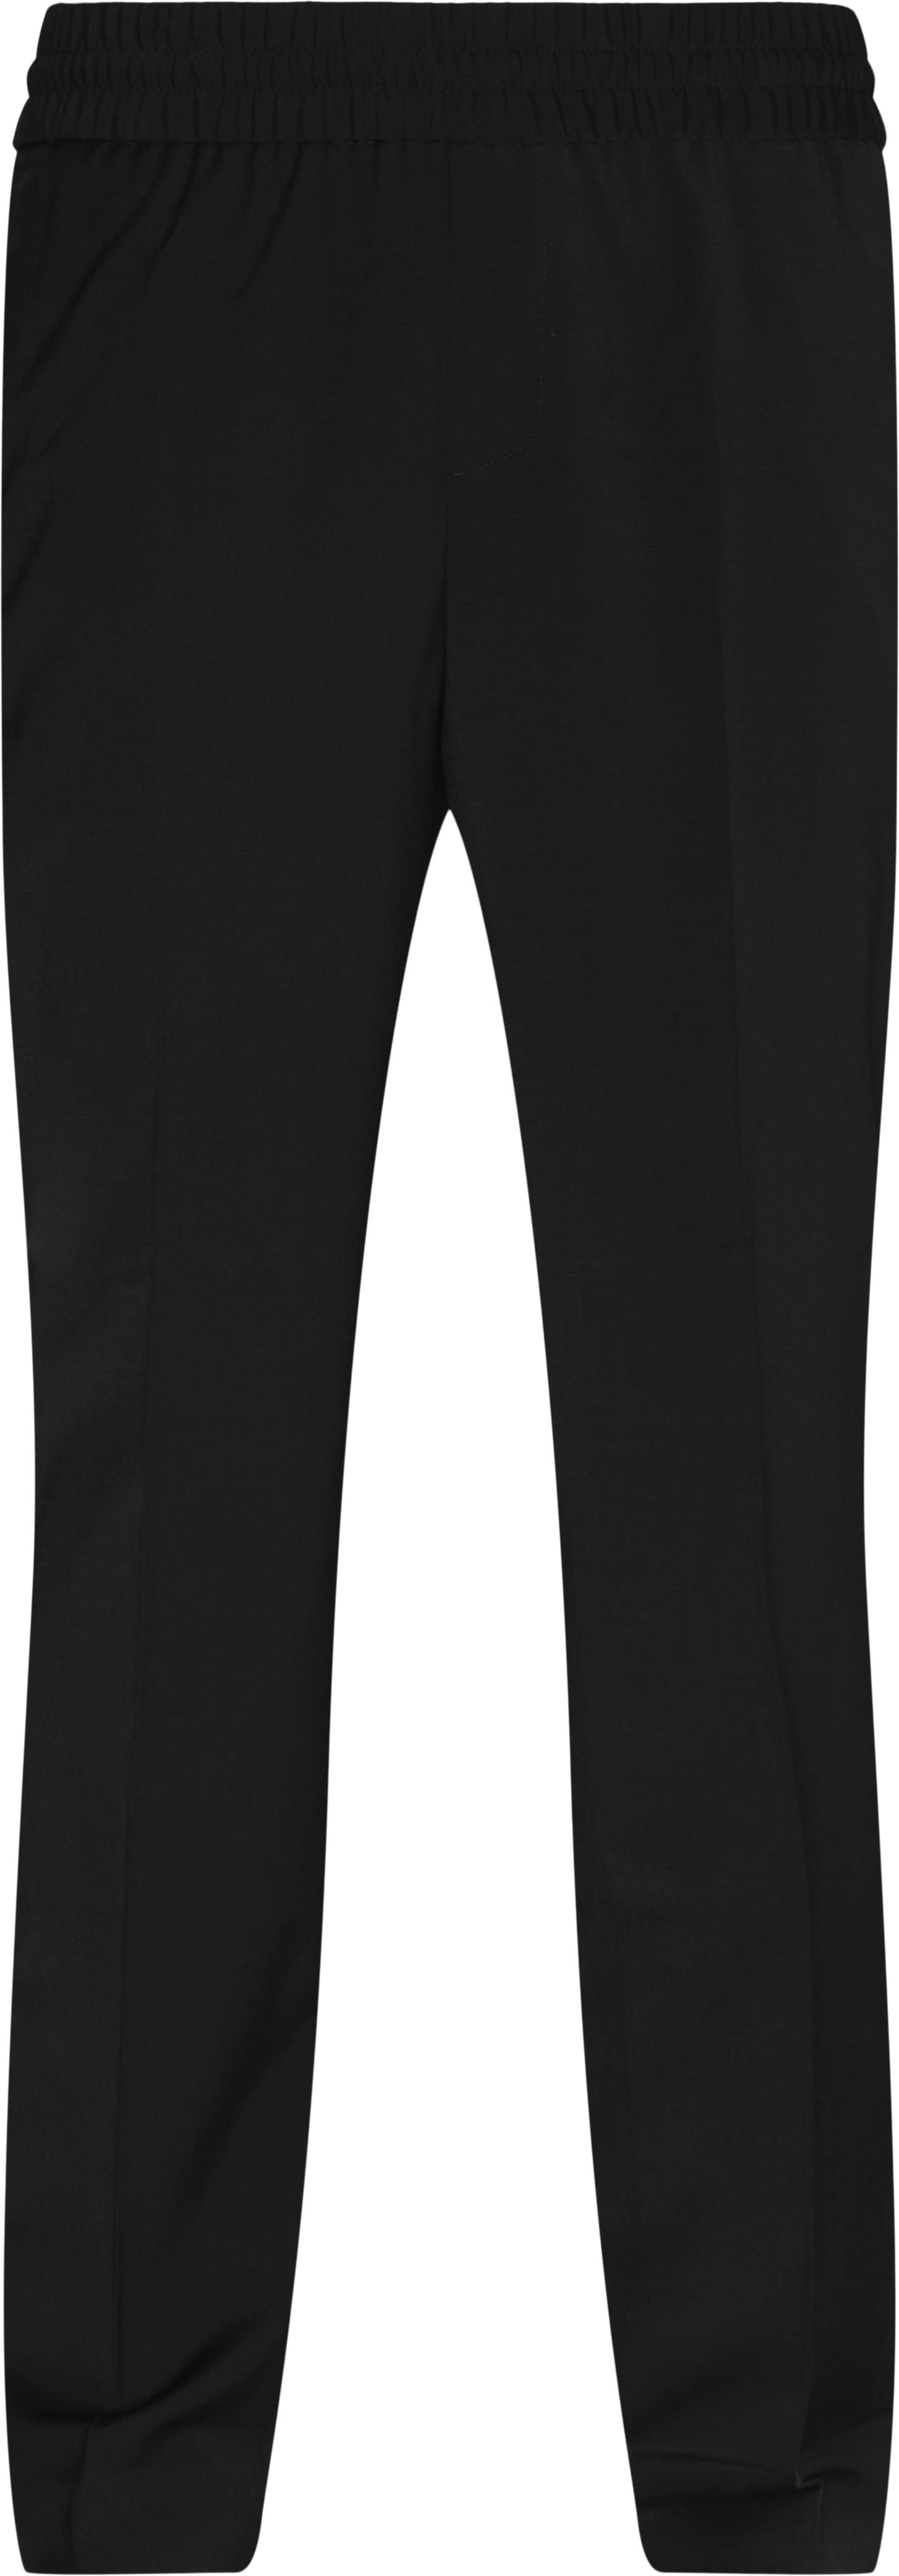 Flynn R Pants - Bukser - Regular fit - Sort